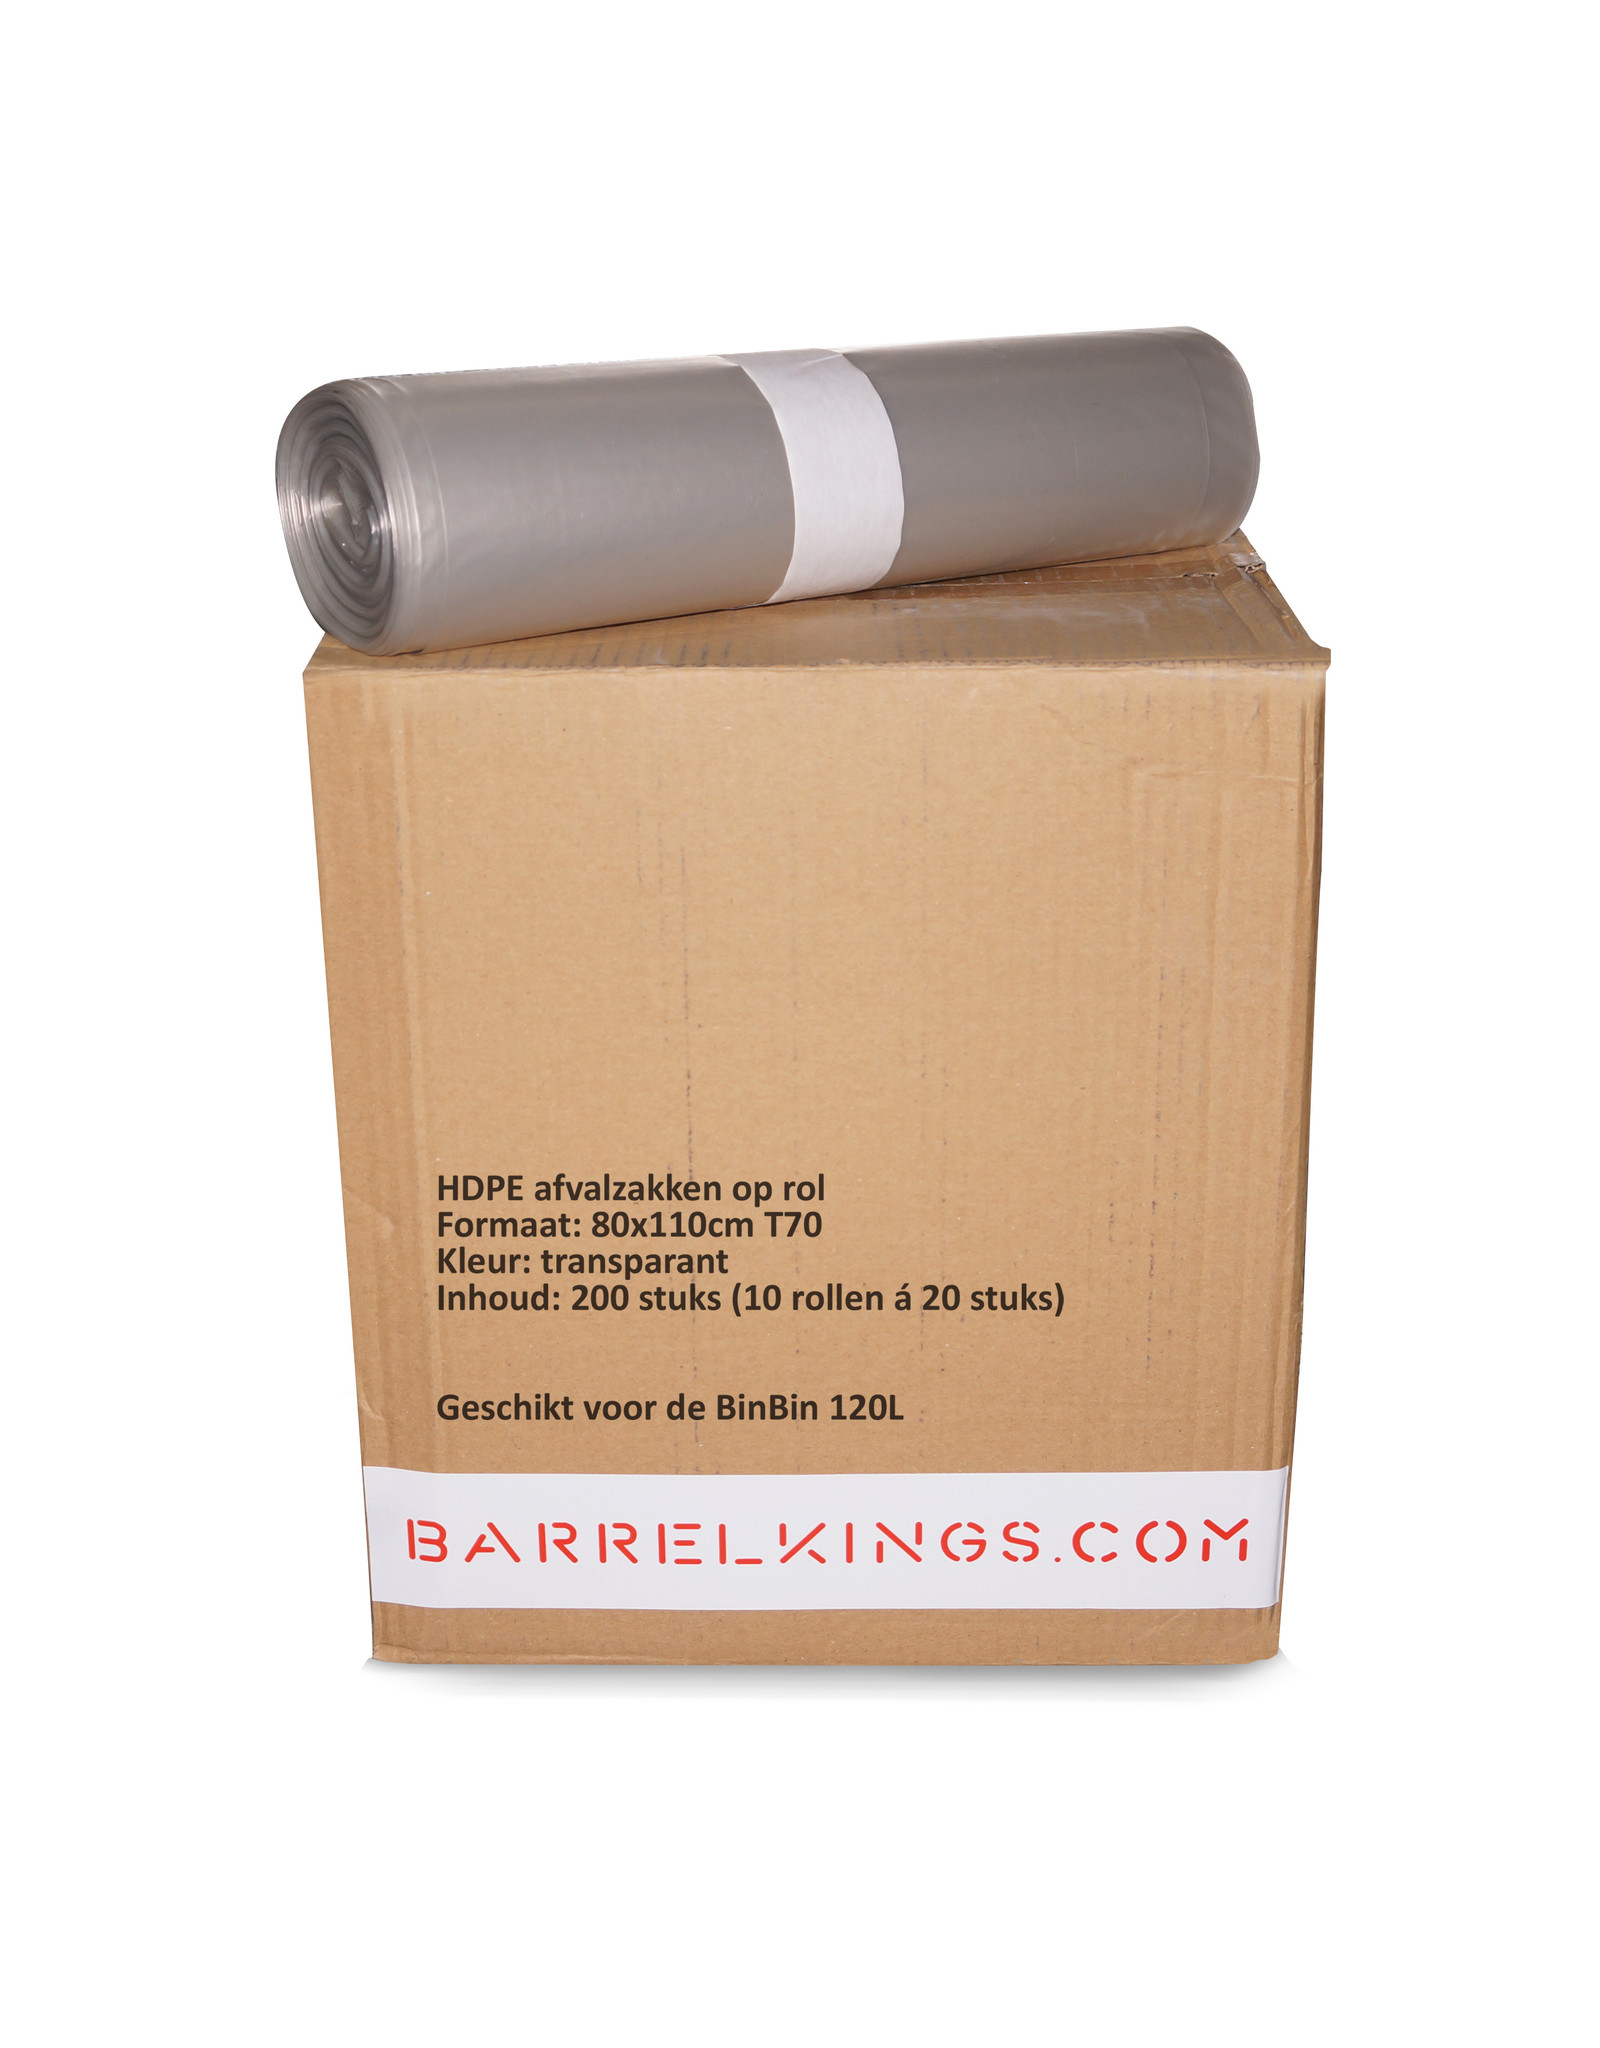 The Binbin BinBin Hole wastebin 120 Liter oildrum with hole lid